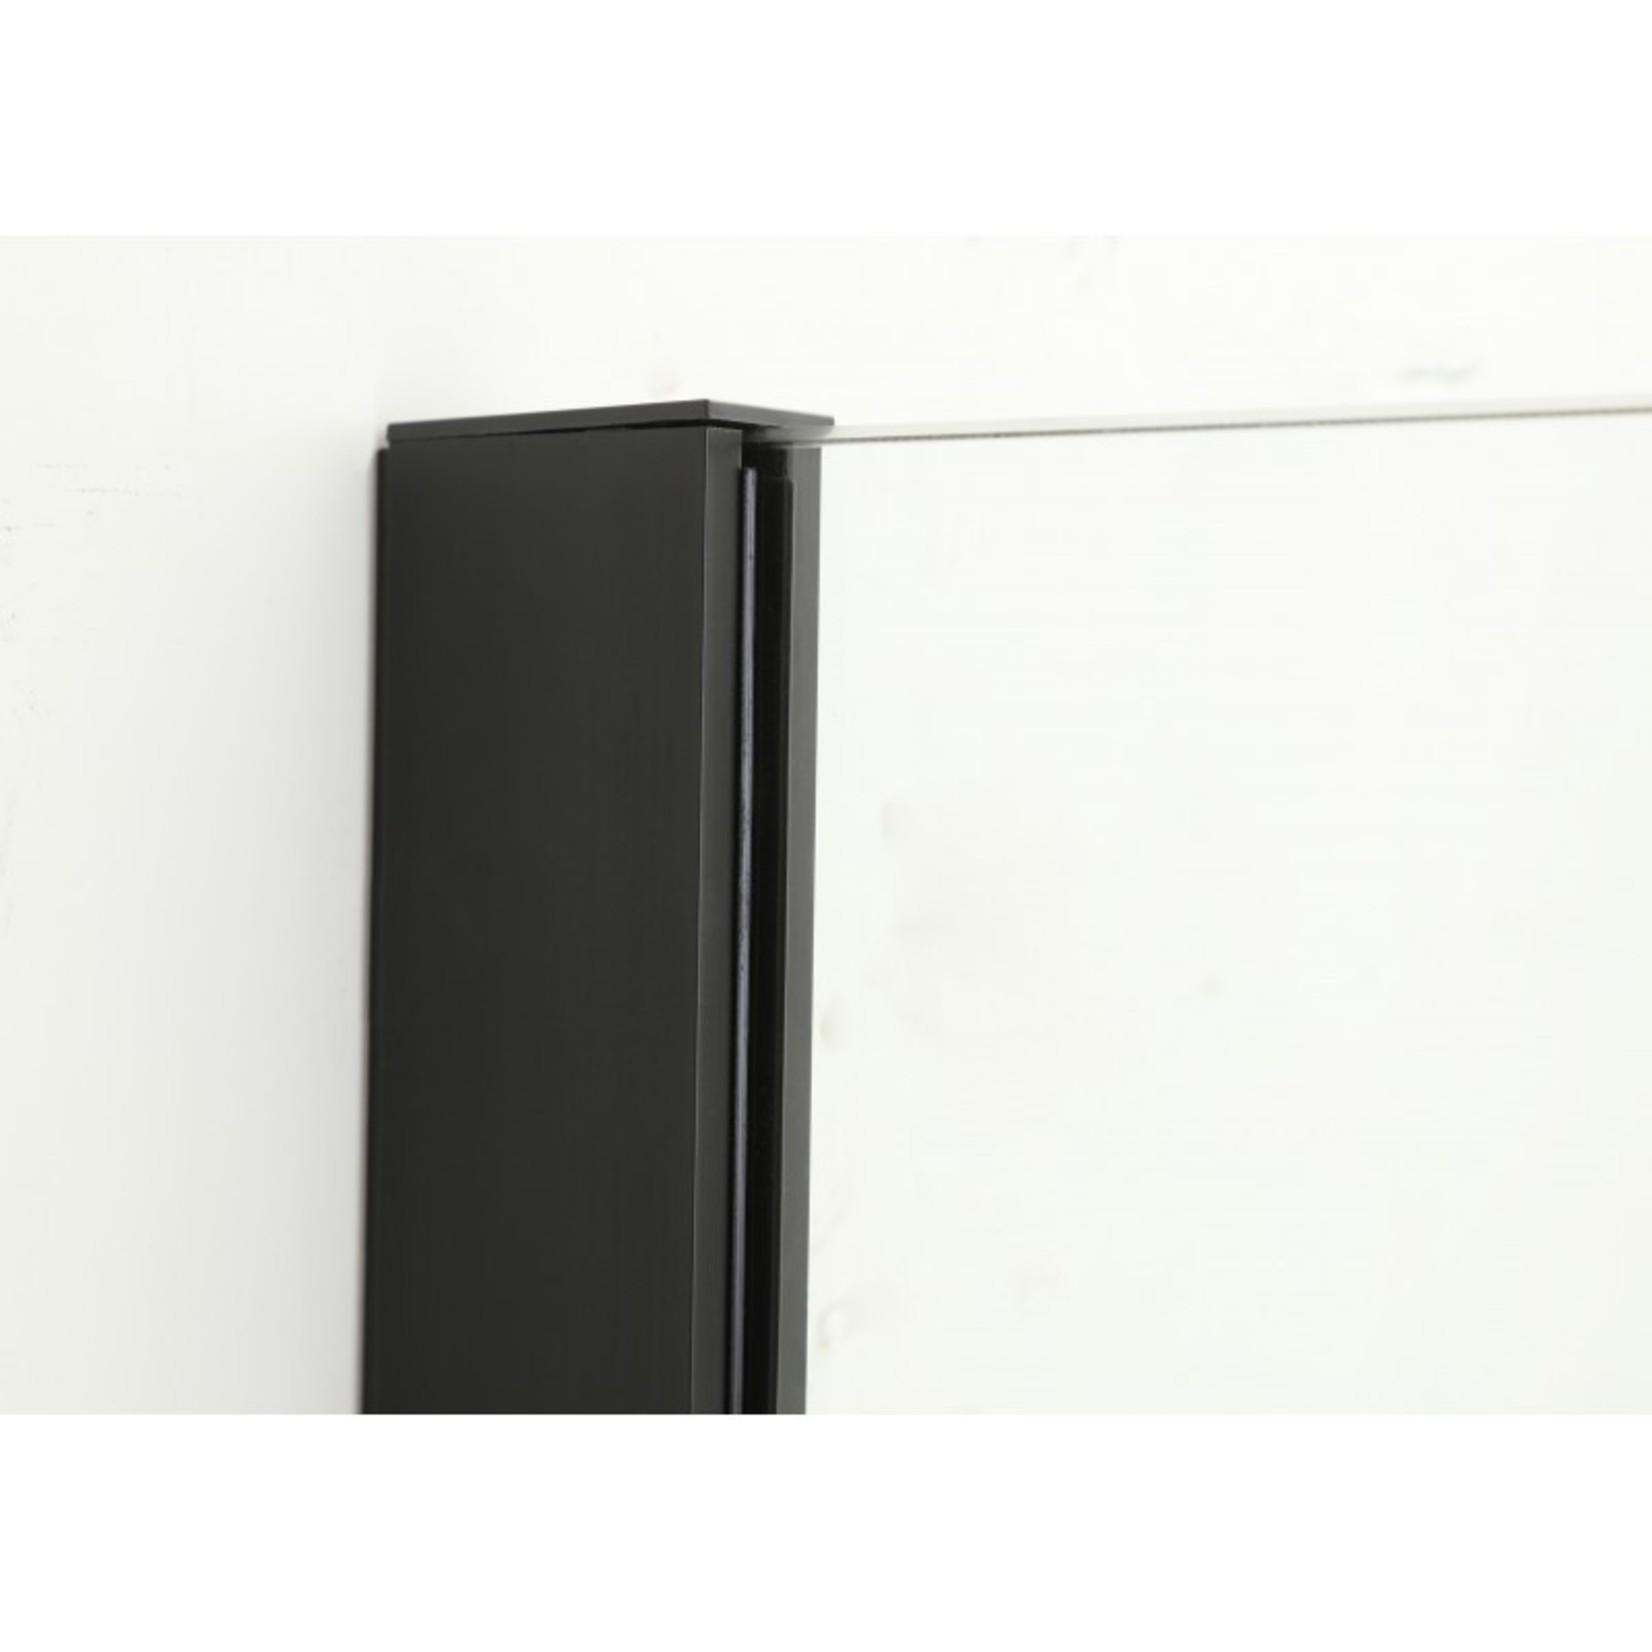 39.5 '' Matte Black Italian style glass shower